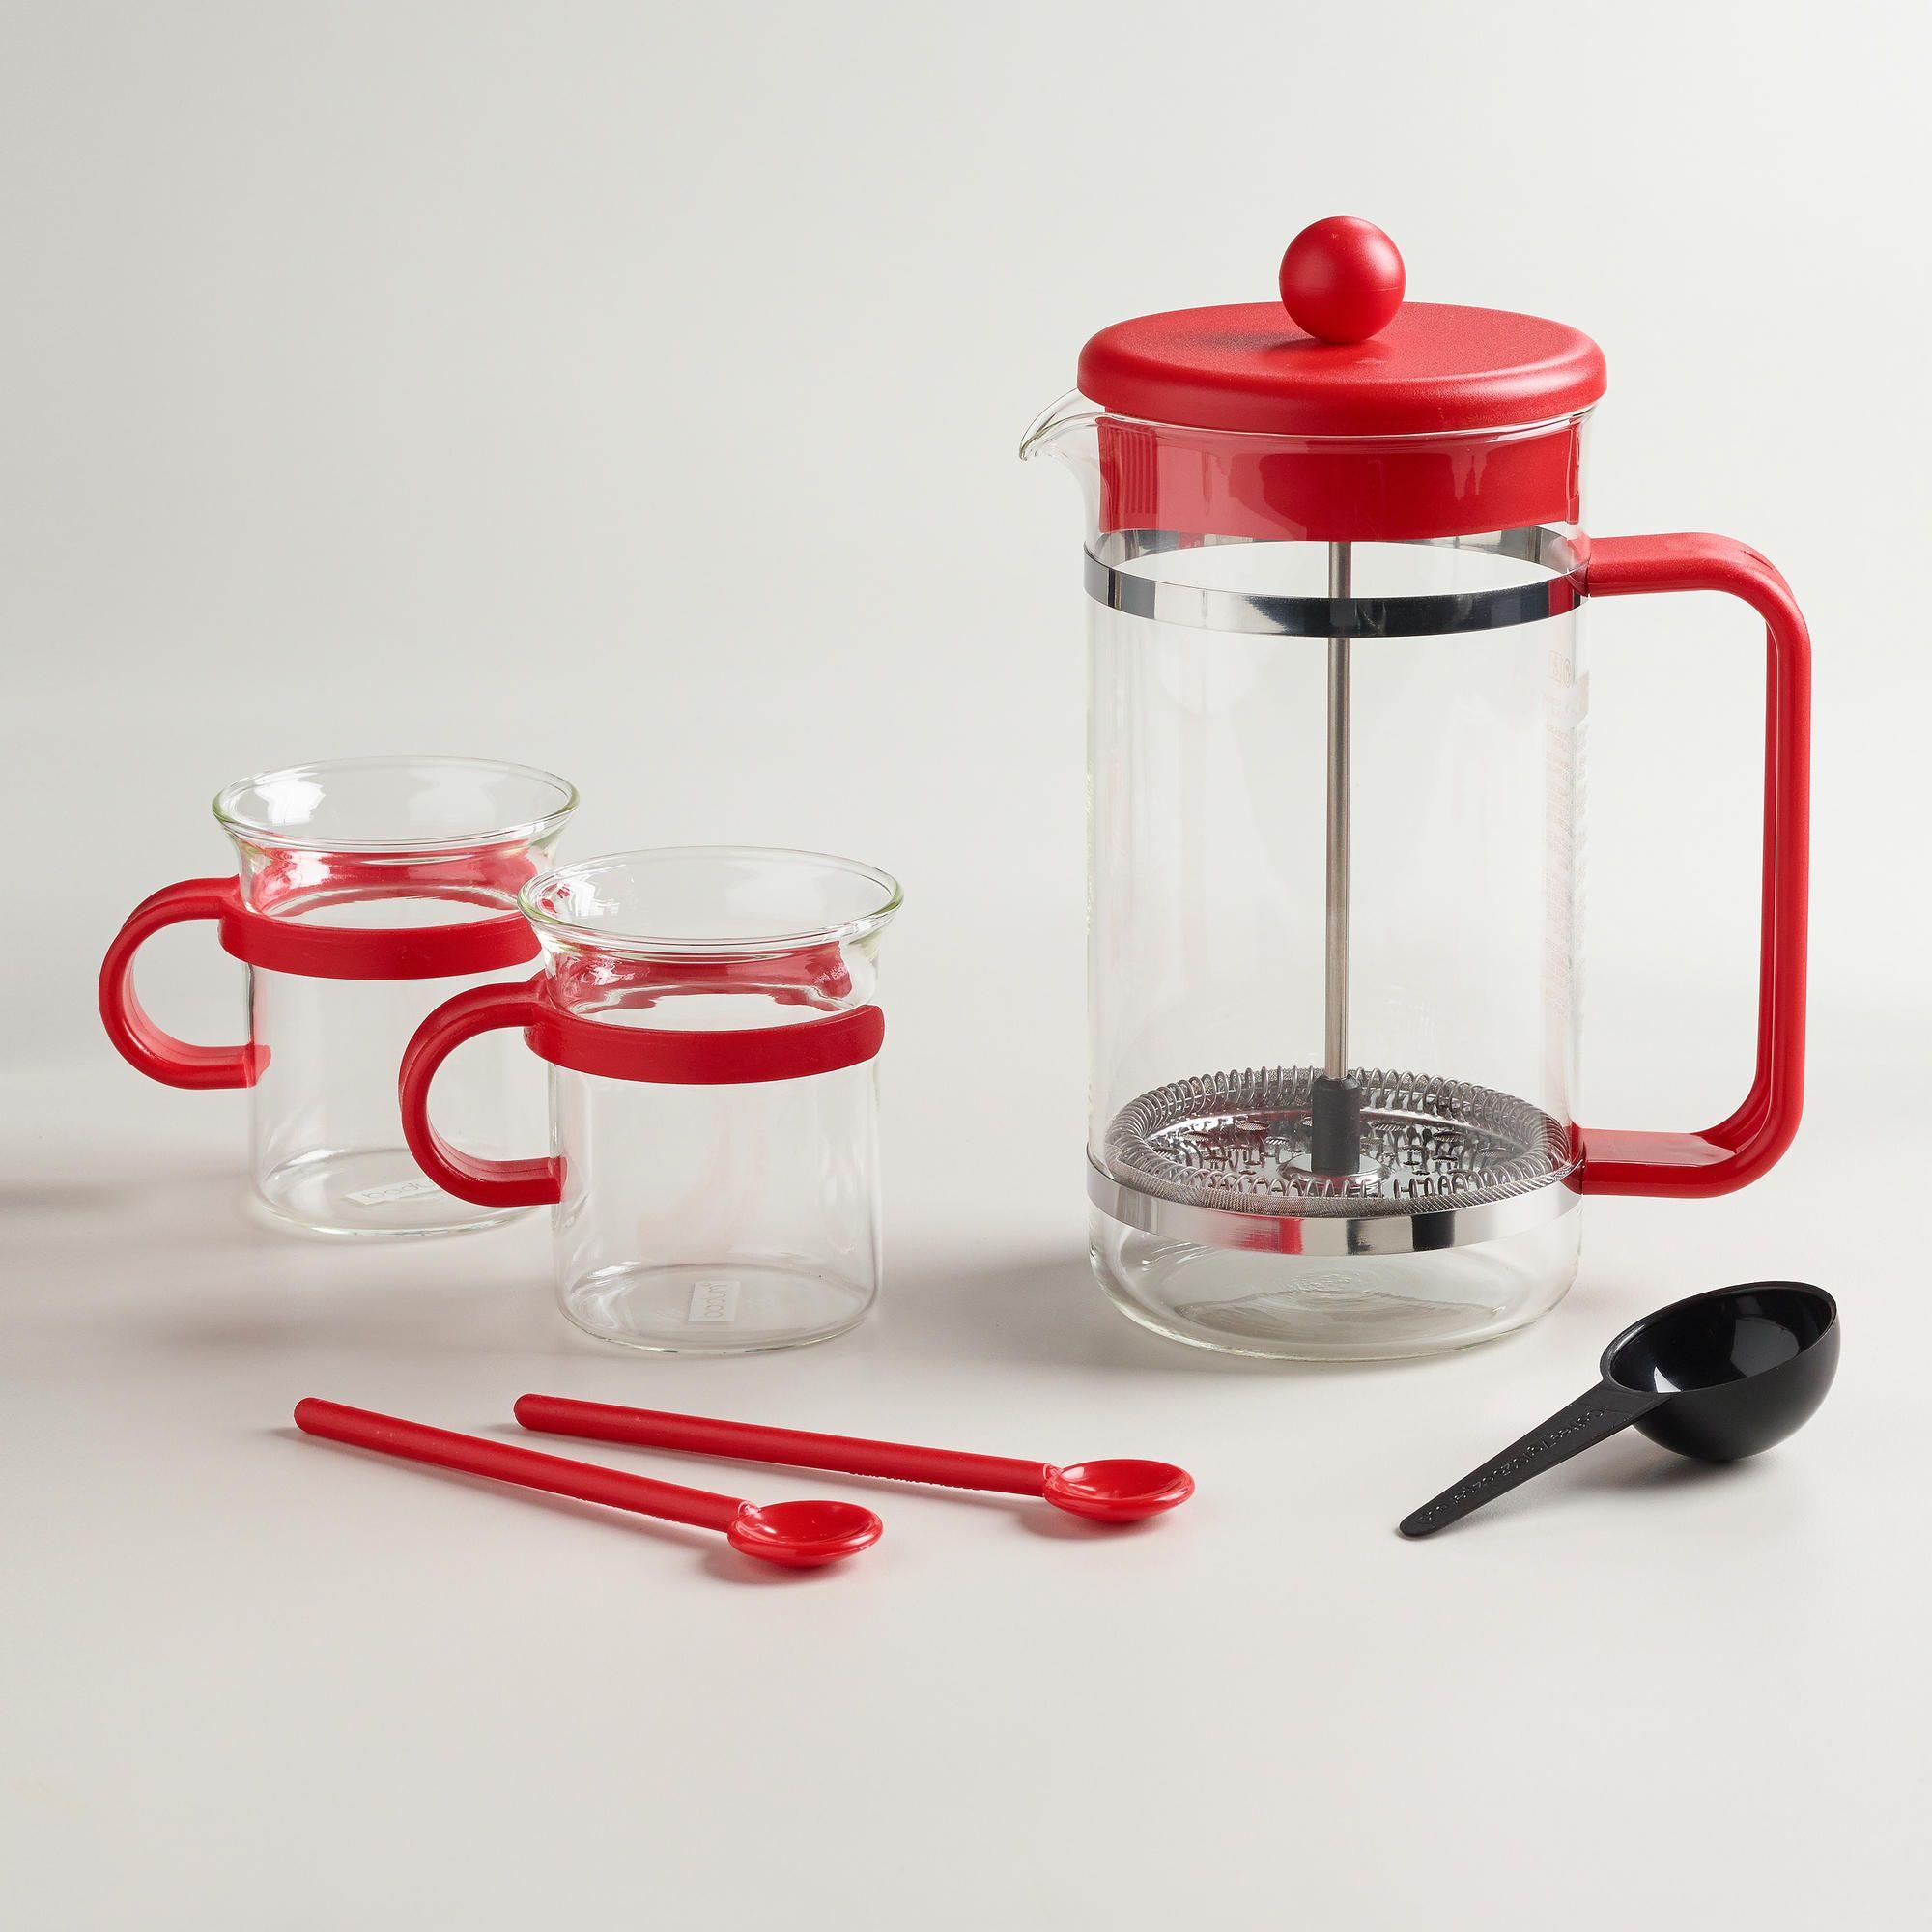 Red Bodum Bistro 5Piece French Press Coffee Maker Set